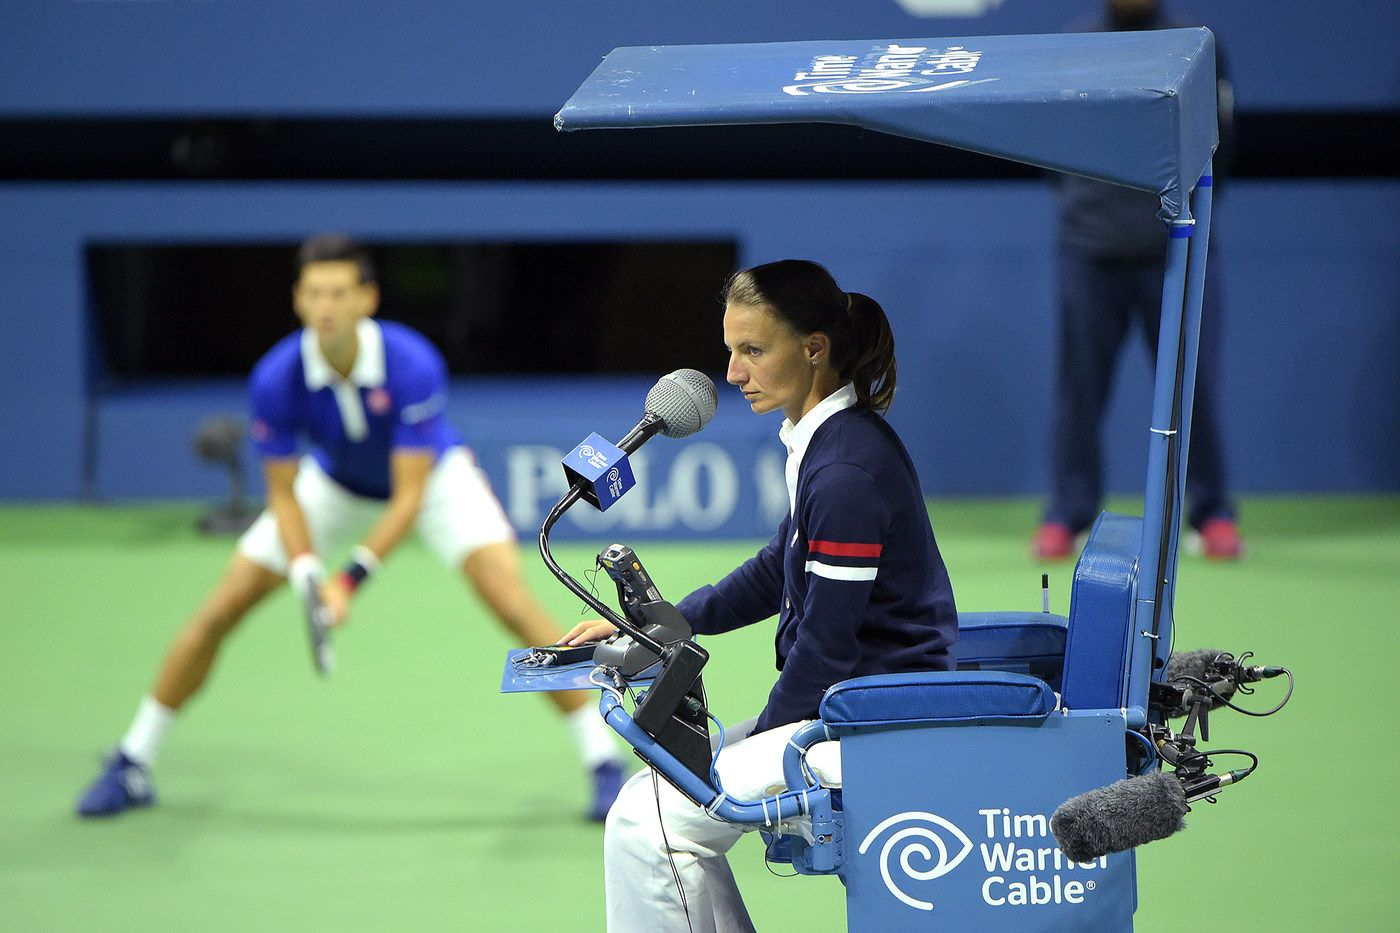 Pin On Novak Djokovic